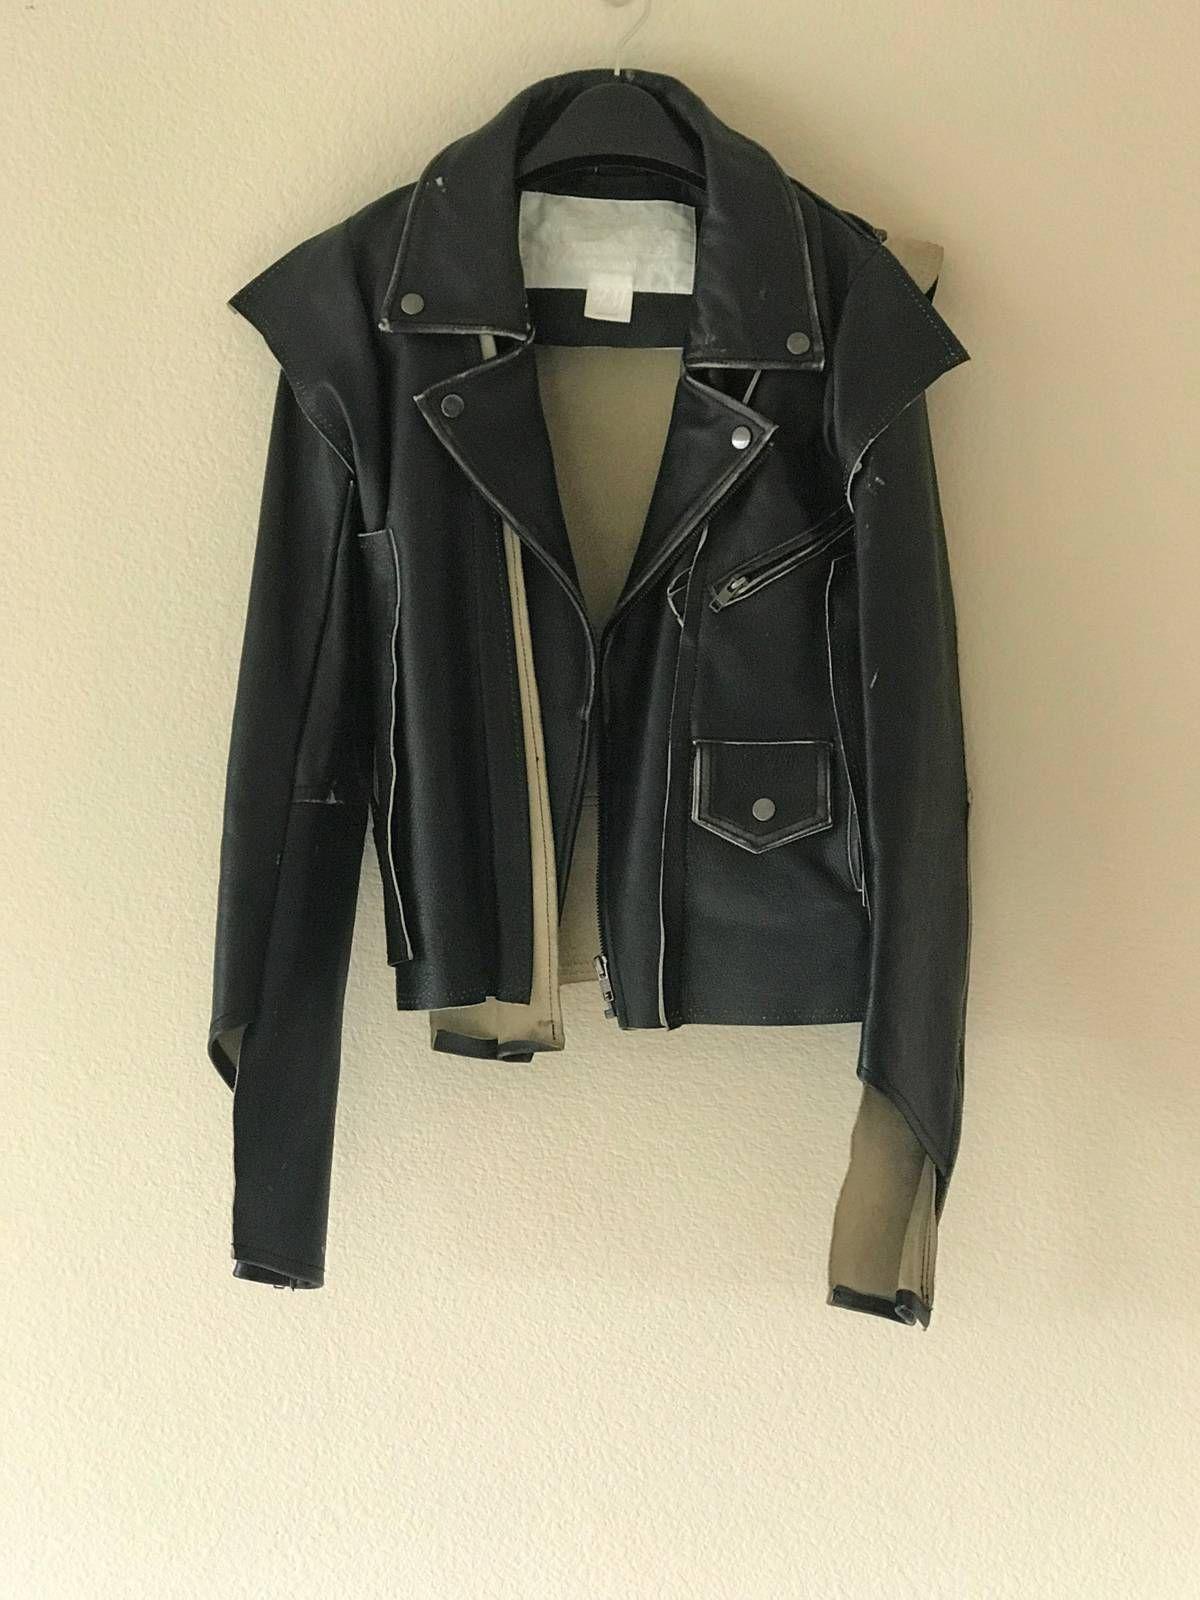 Buy Maison Martin Margiela RARE Maison Margiela x H&M Deconstructed Biker  Jacket (Small),